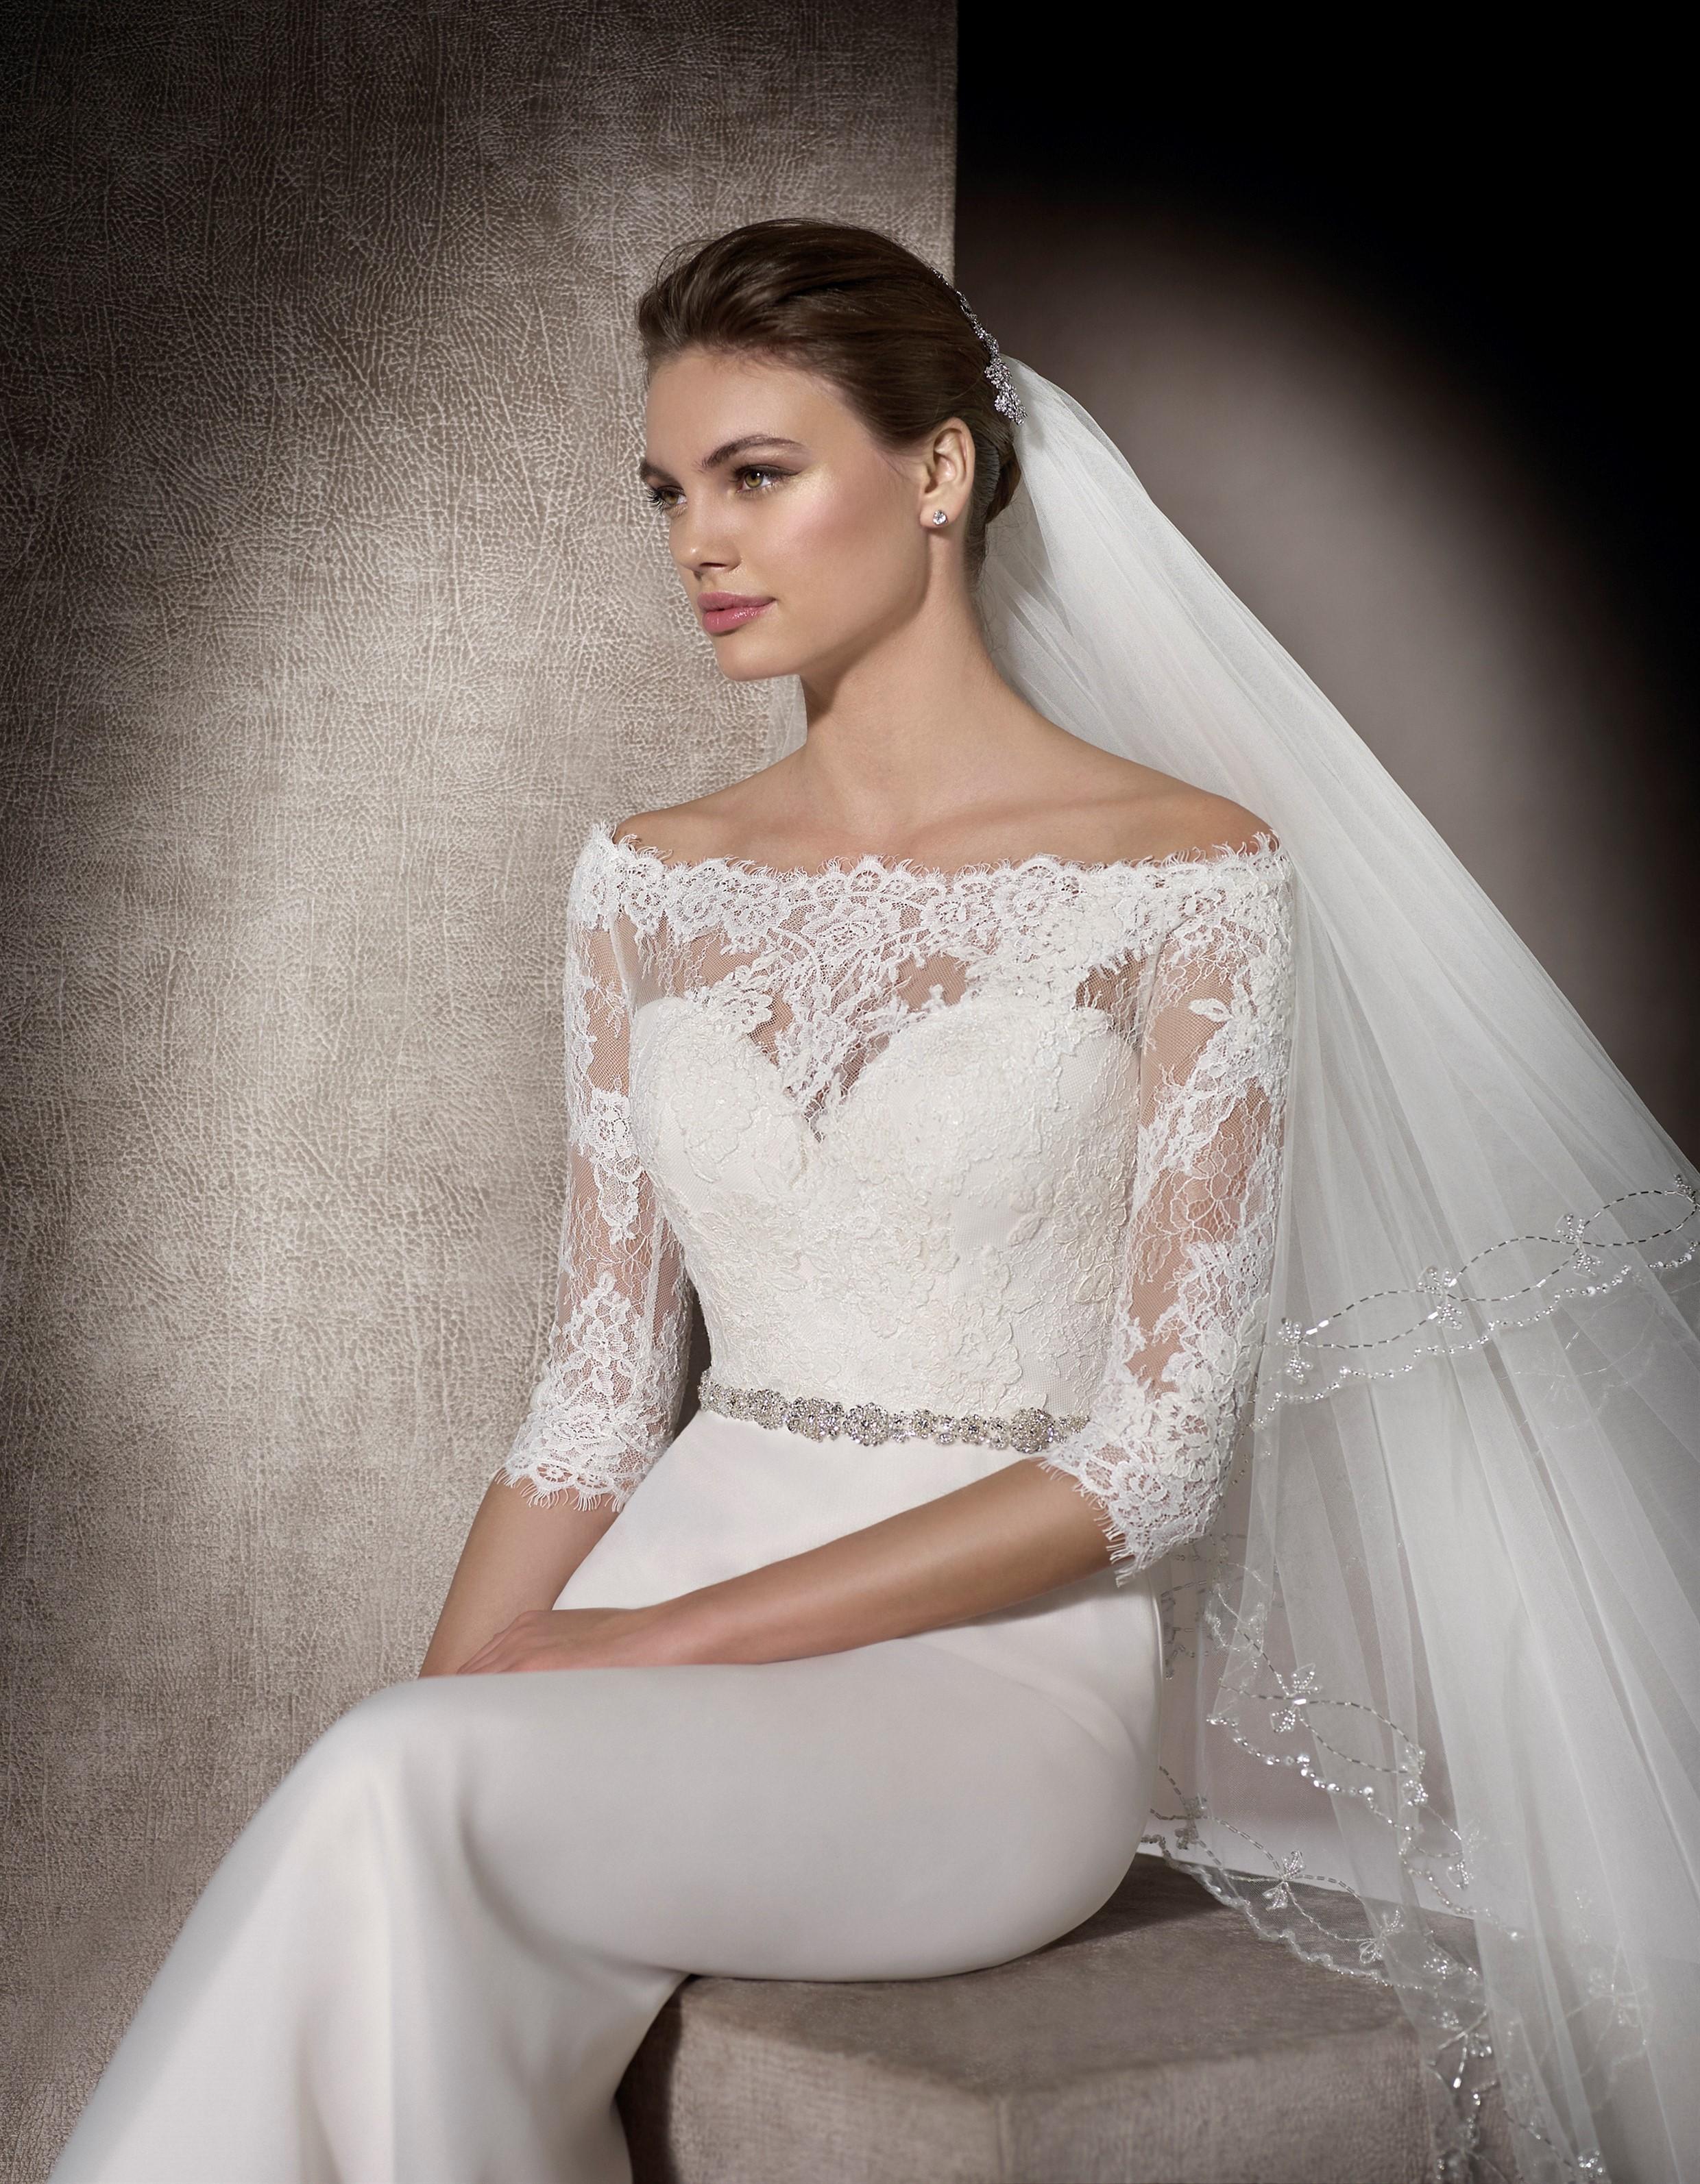 marissa wedding dresses photo - 1